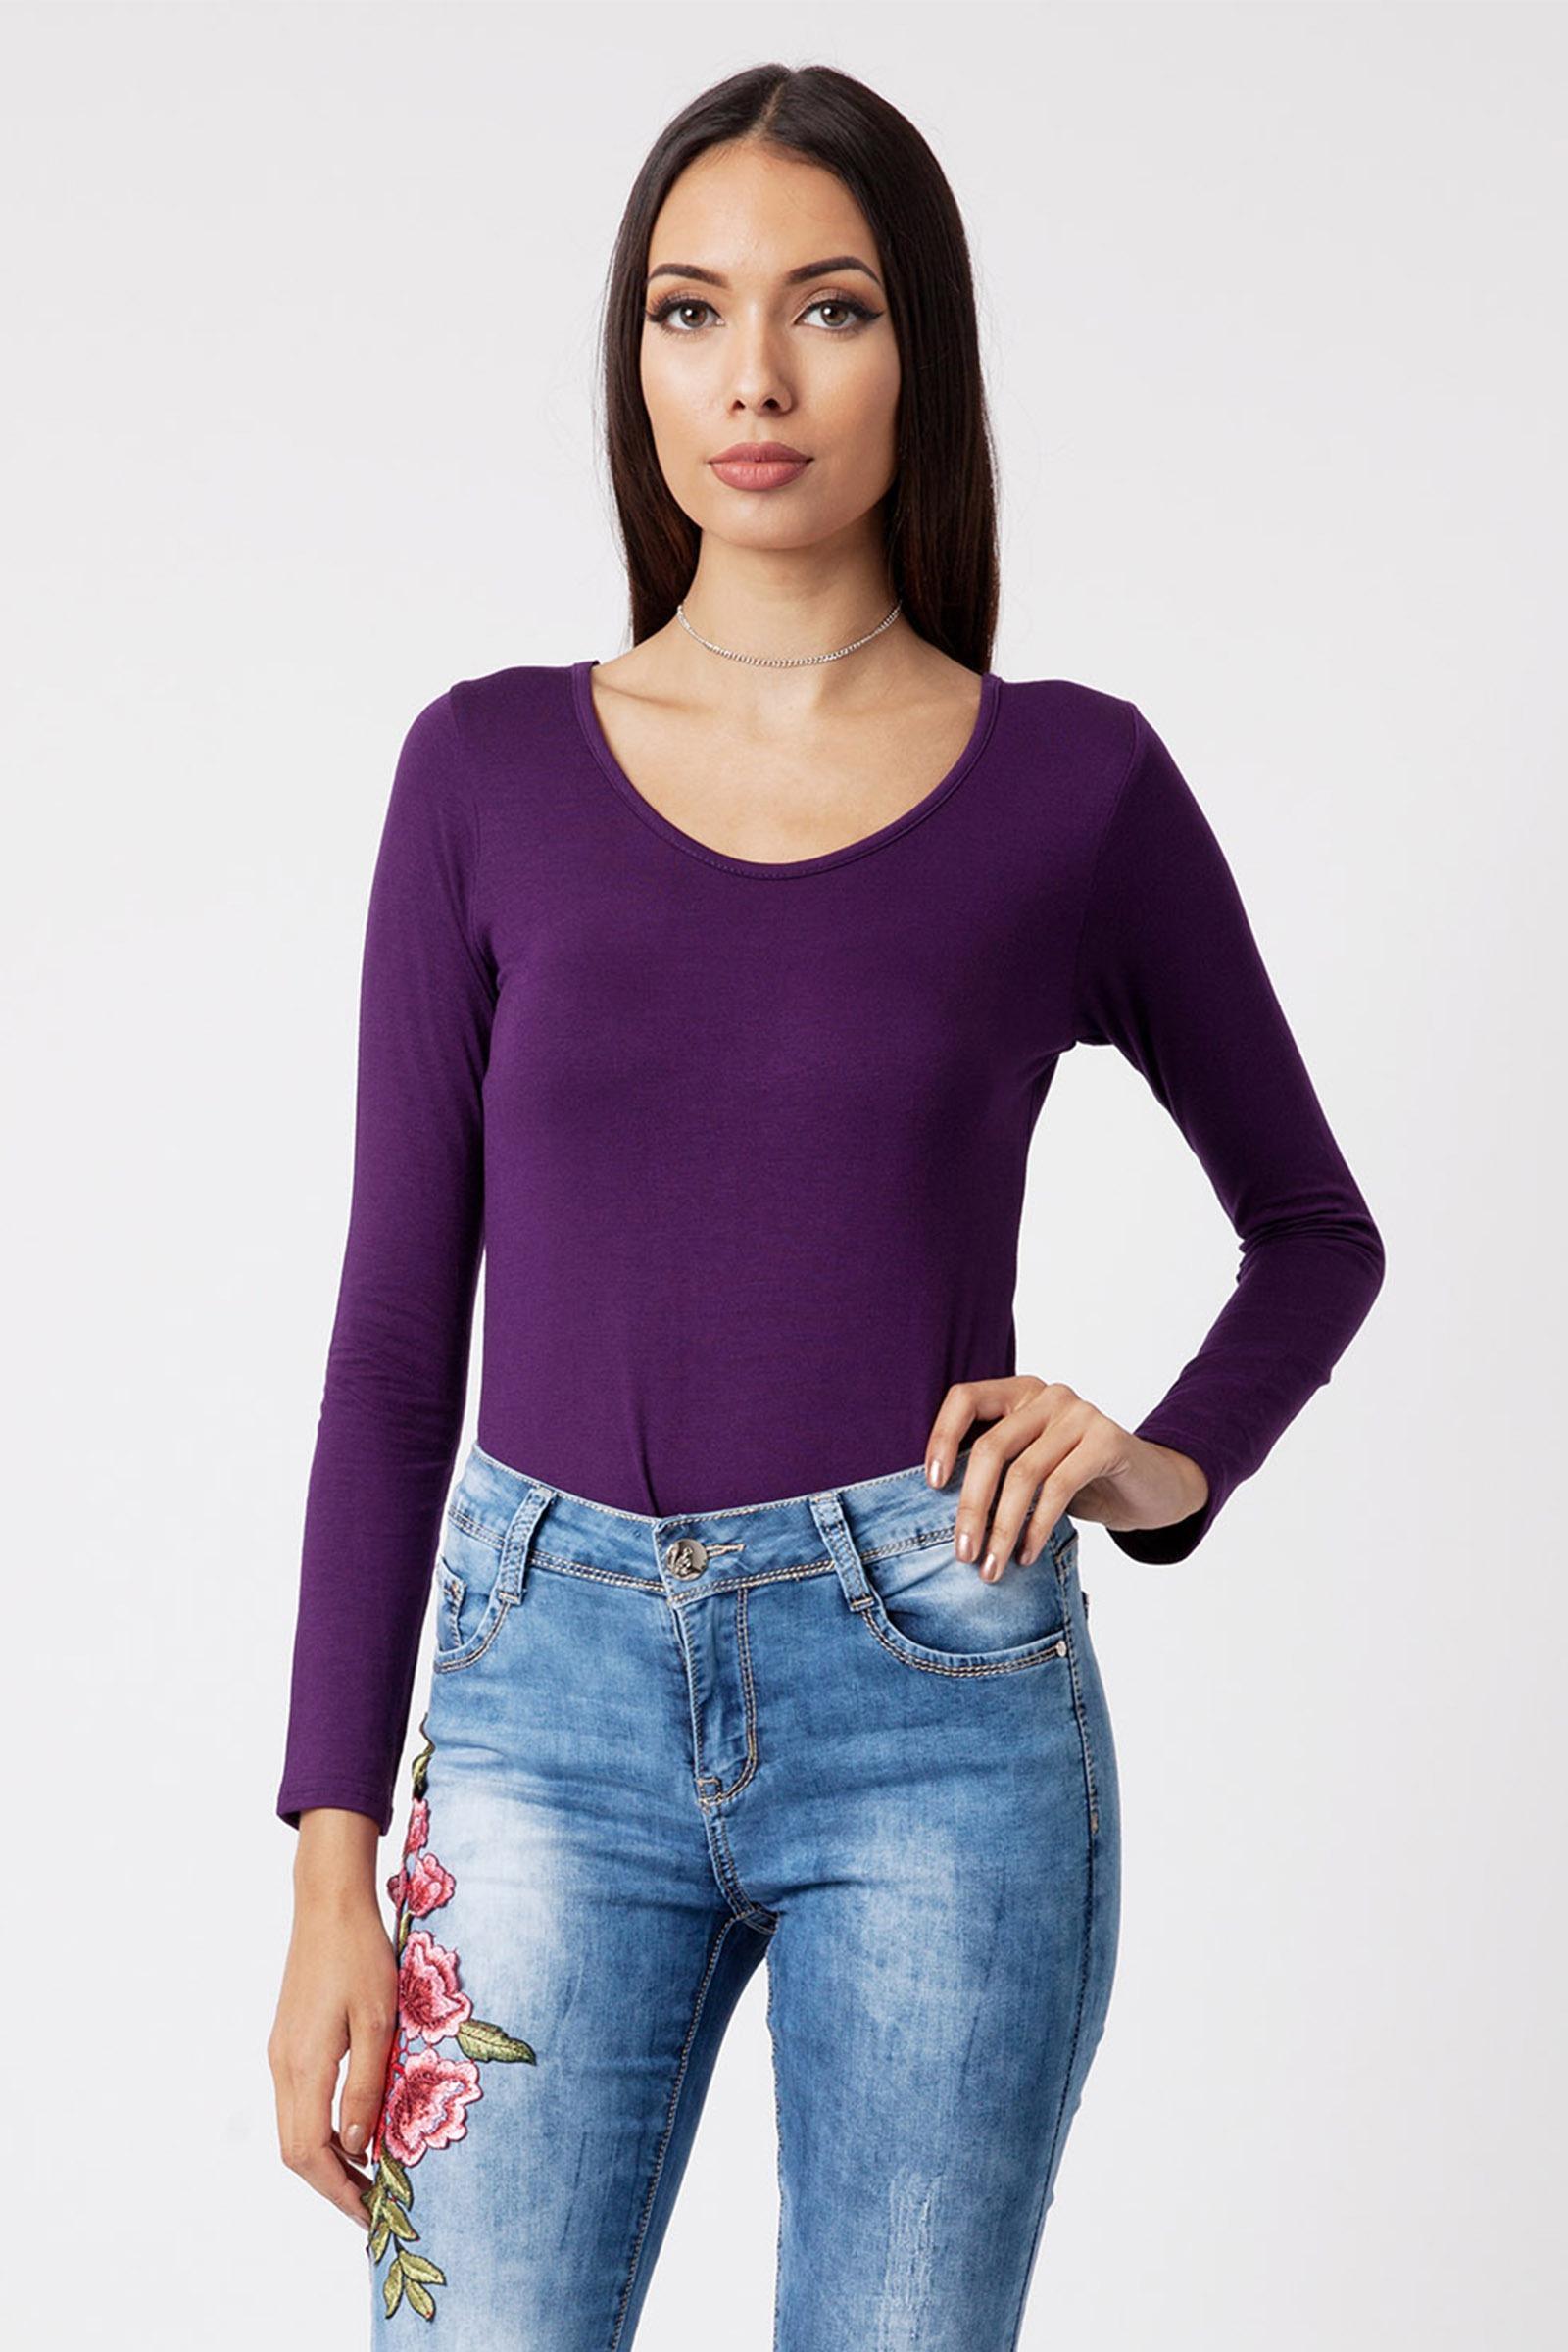 62db40b242 Product Details  Purple Long Sleeve Scoop Neck Bodysuit ...